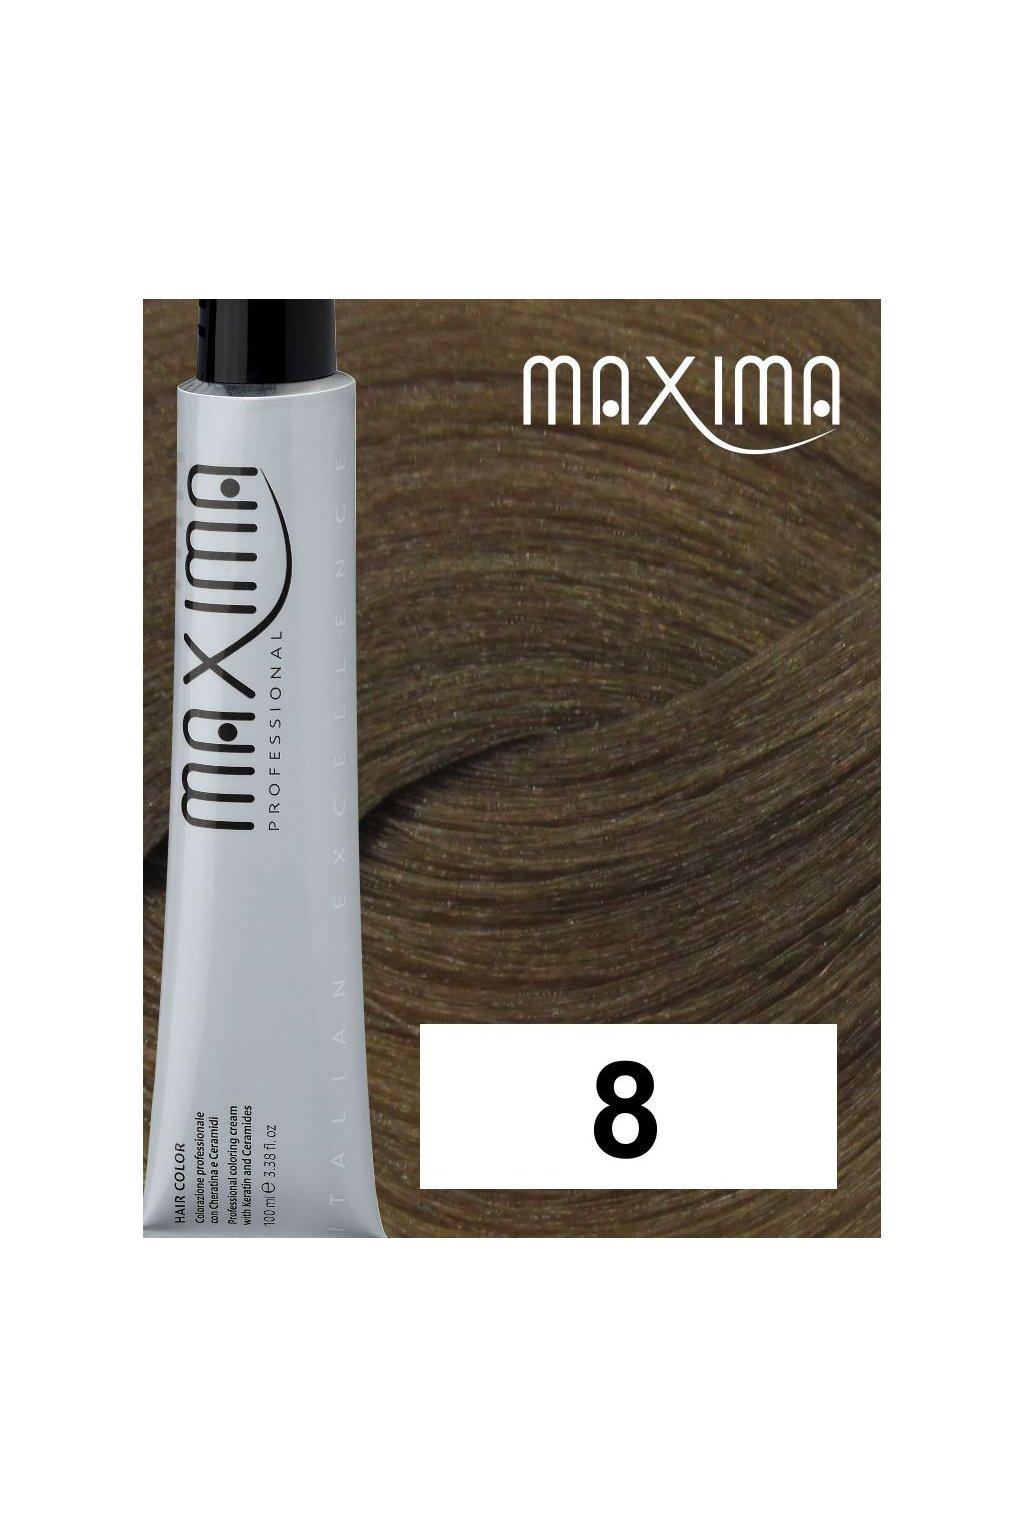 8 max